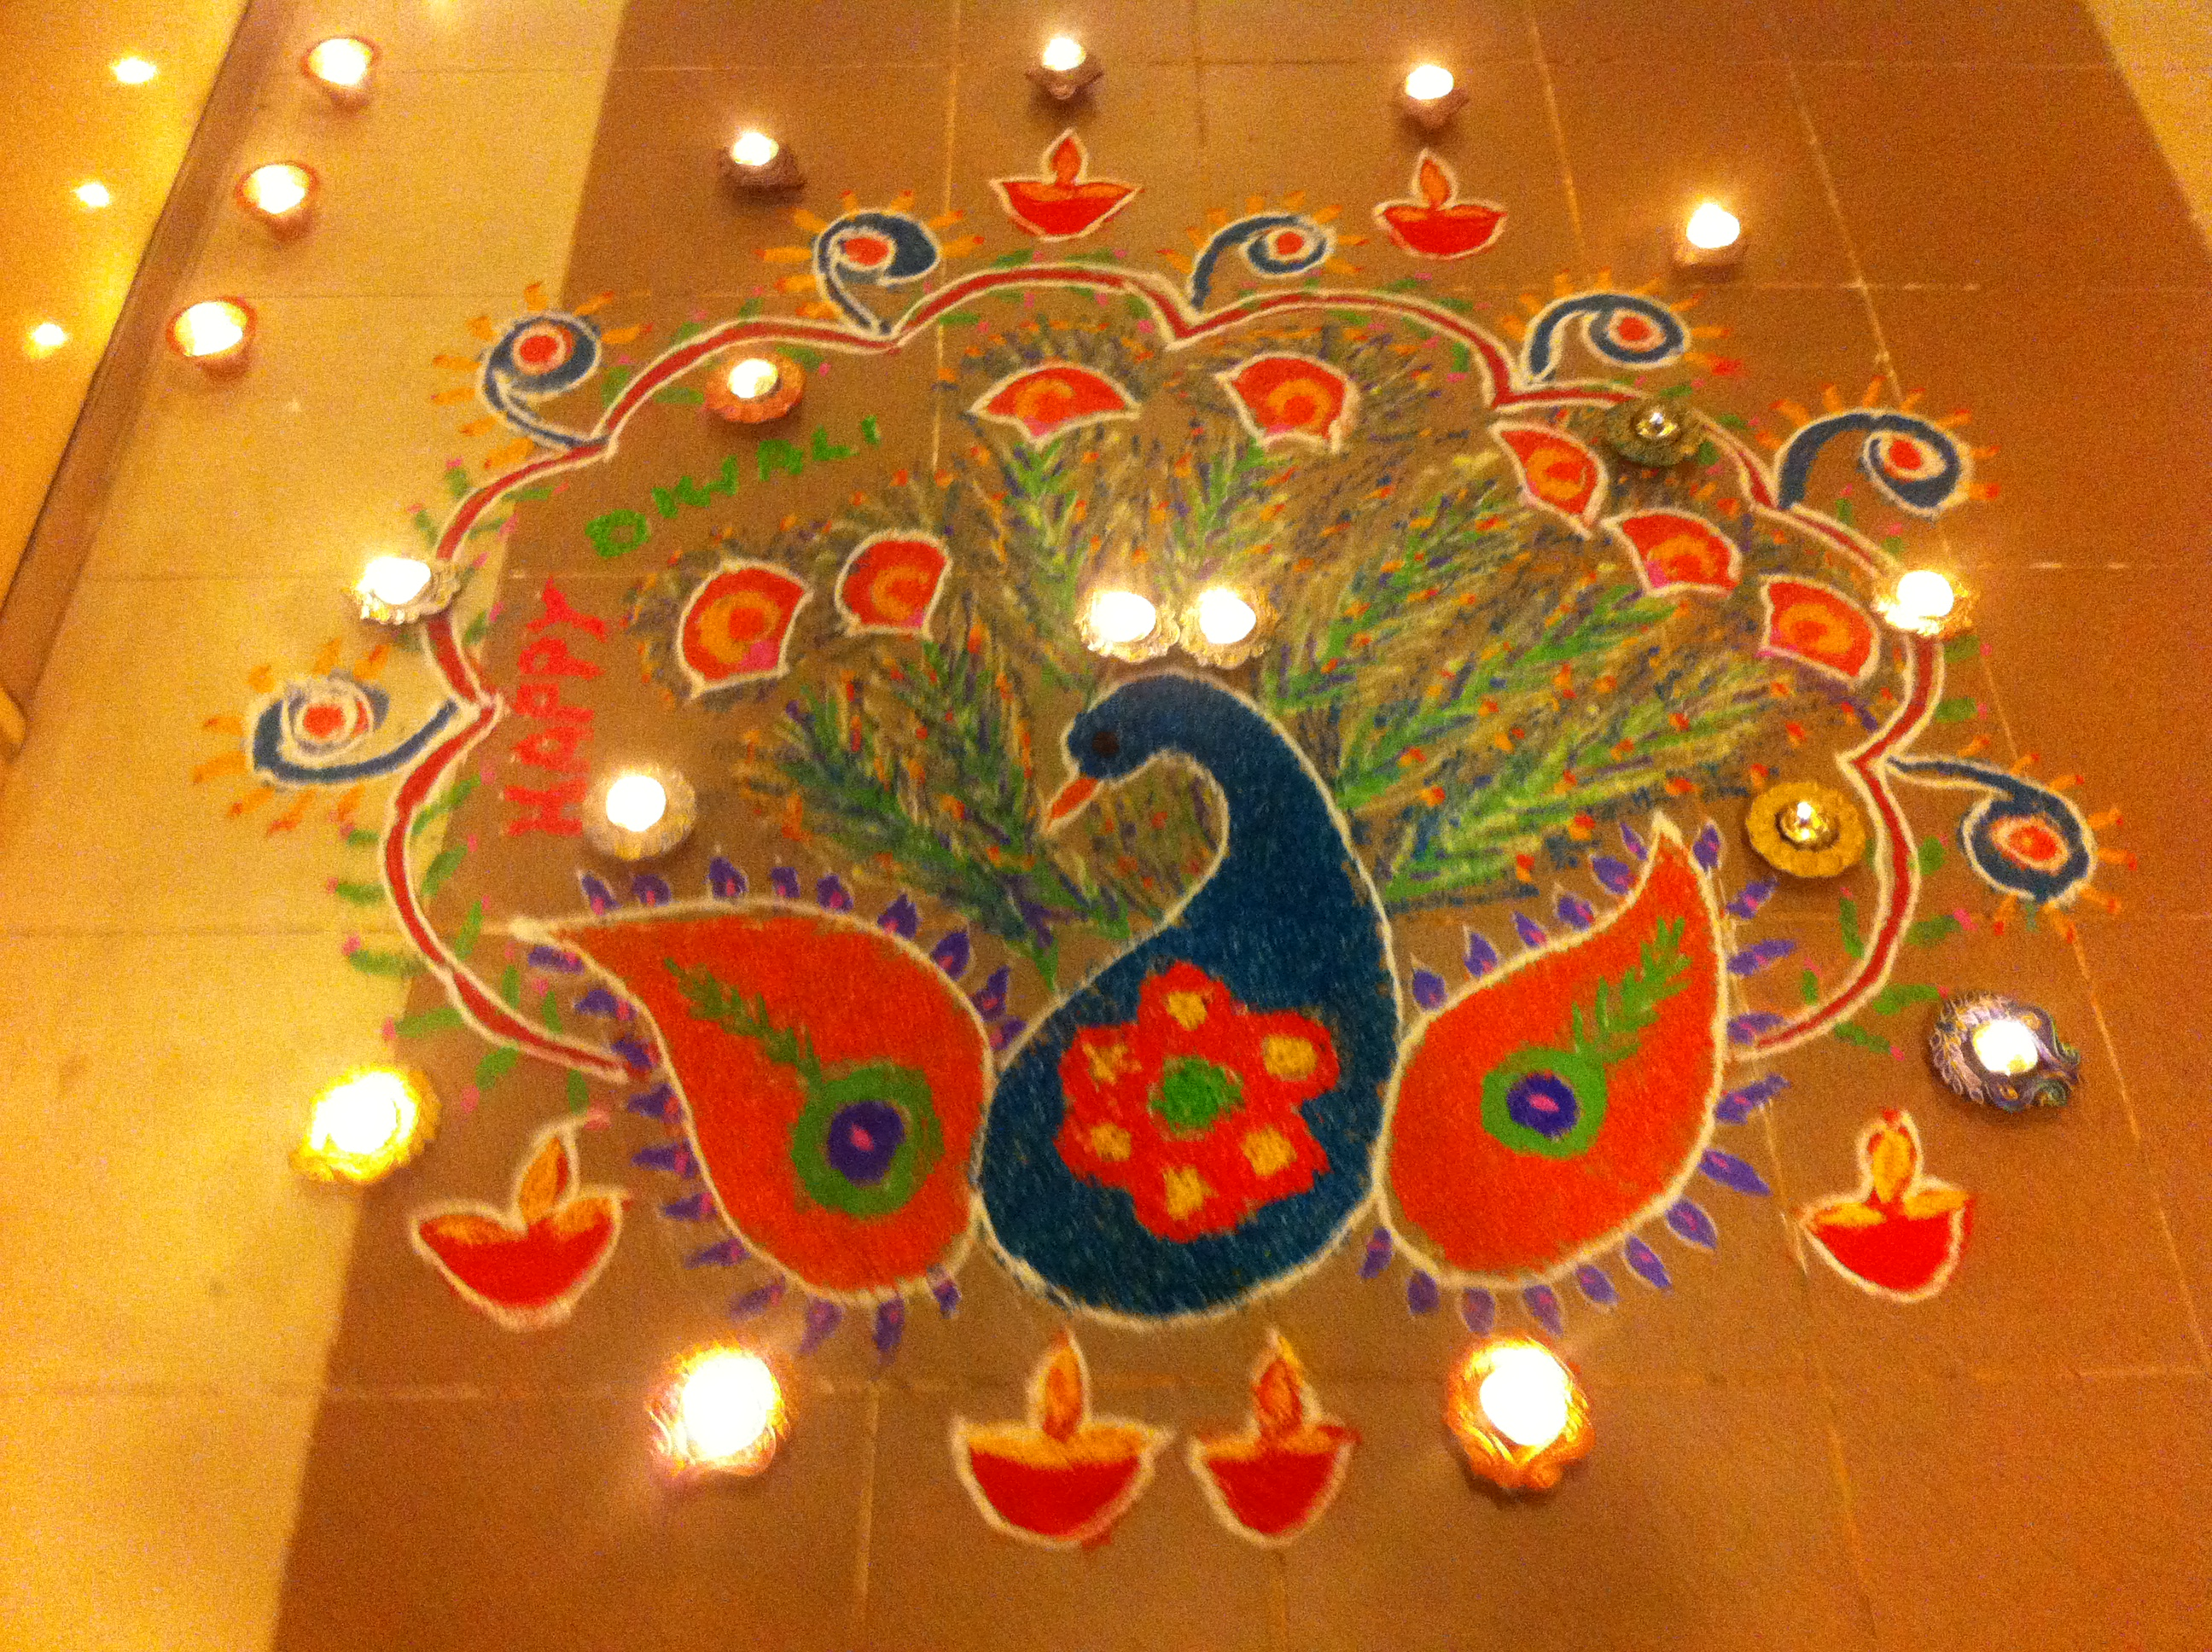 celebrating diwali with volunteering india volunteer work india